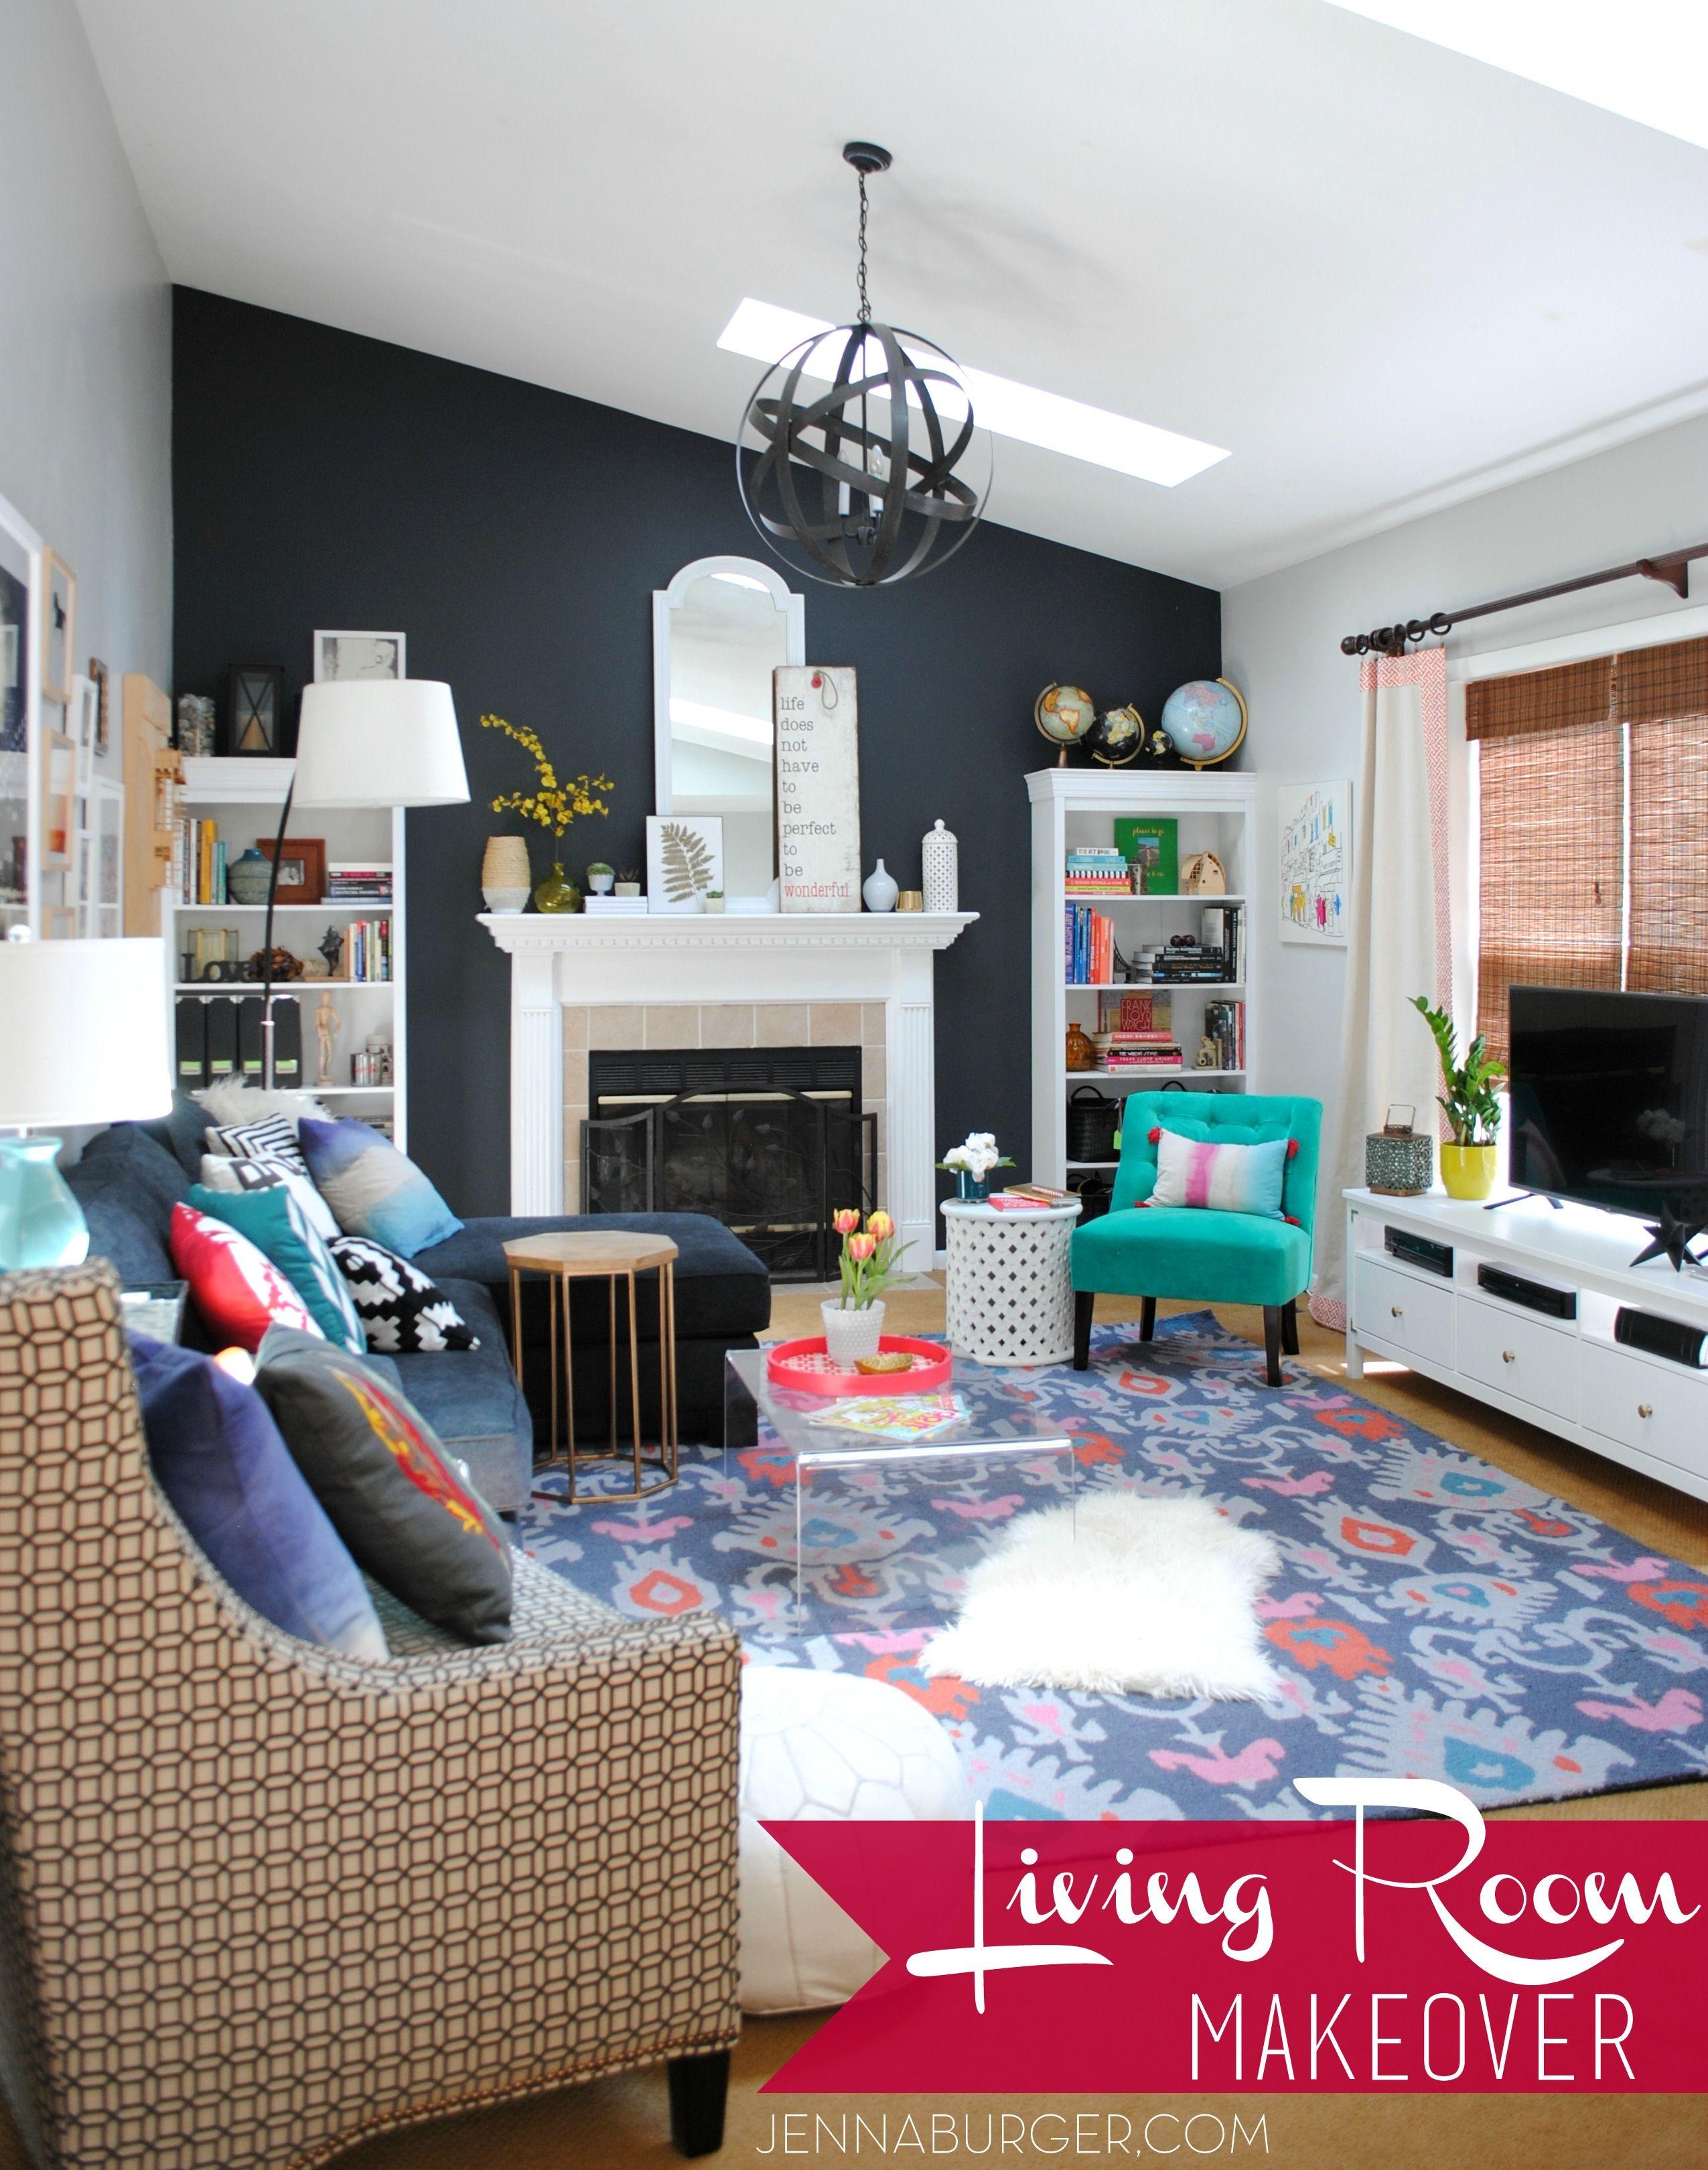 Living Room Makeover With Bold Black  Pops Of Color  Emerald Pleasing Living Room Makeover Design Decoration